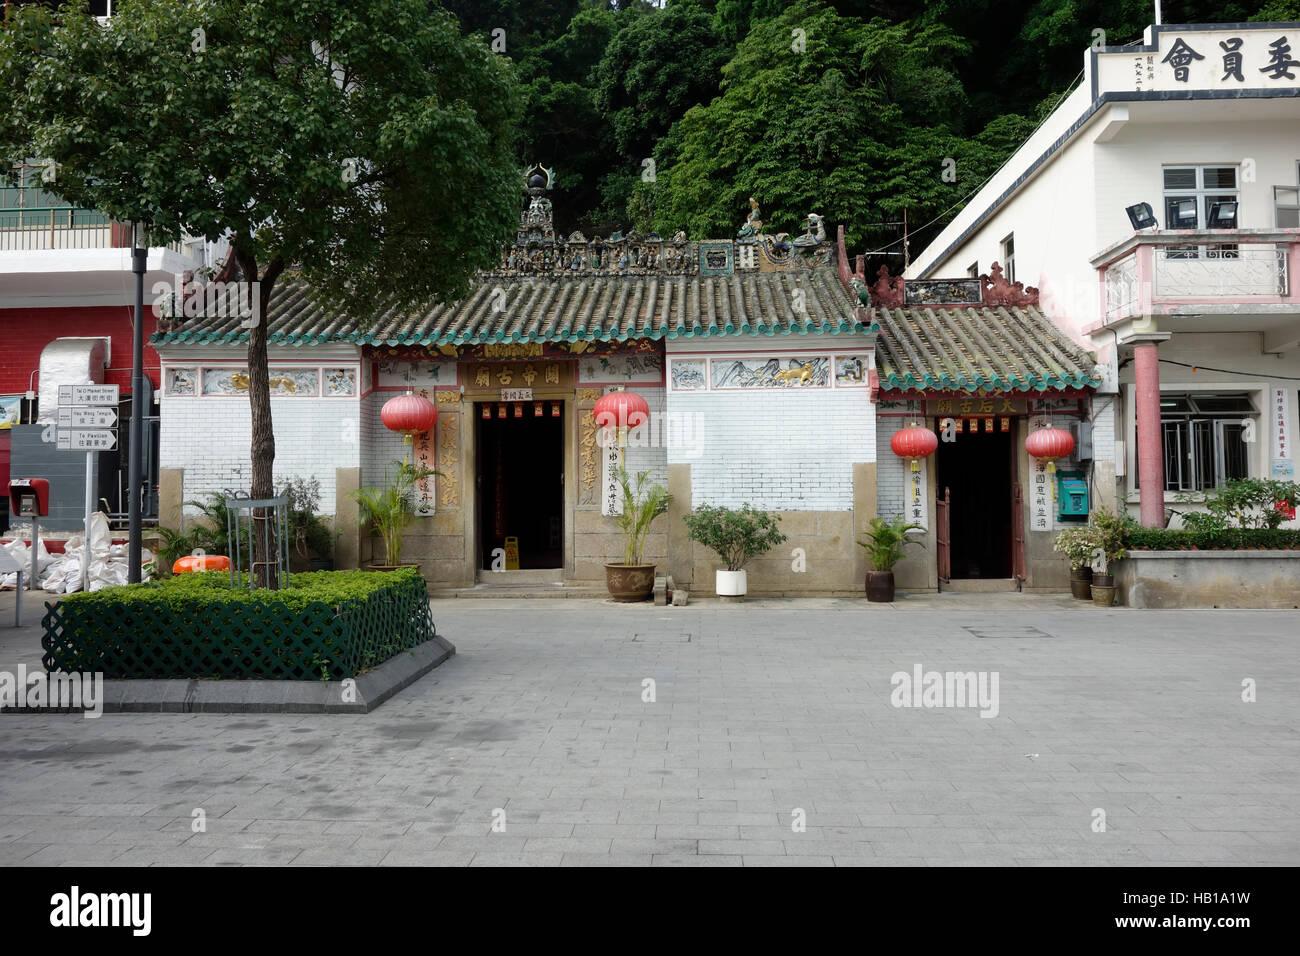 Tai O fishing village located on Lantau Island, Hong Kong. - Stock Image